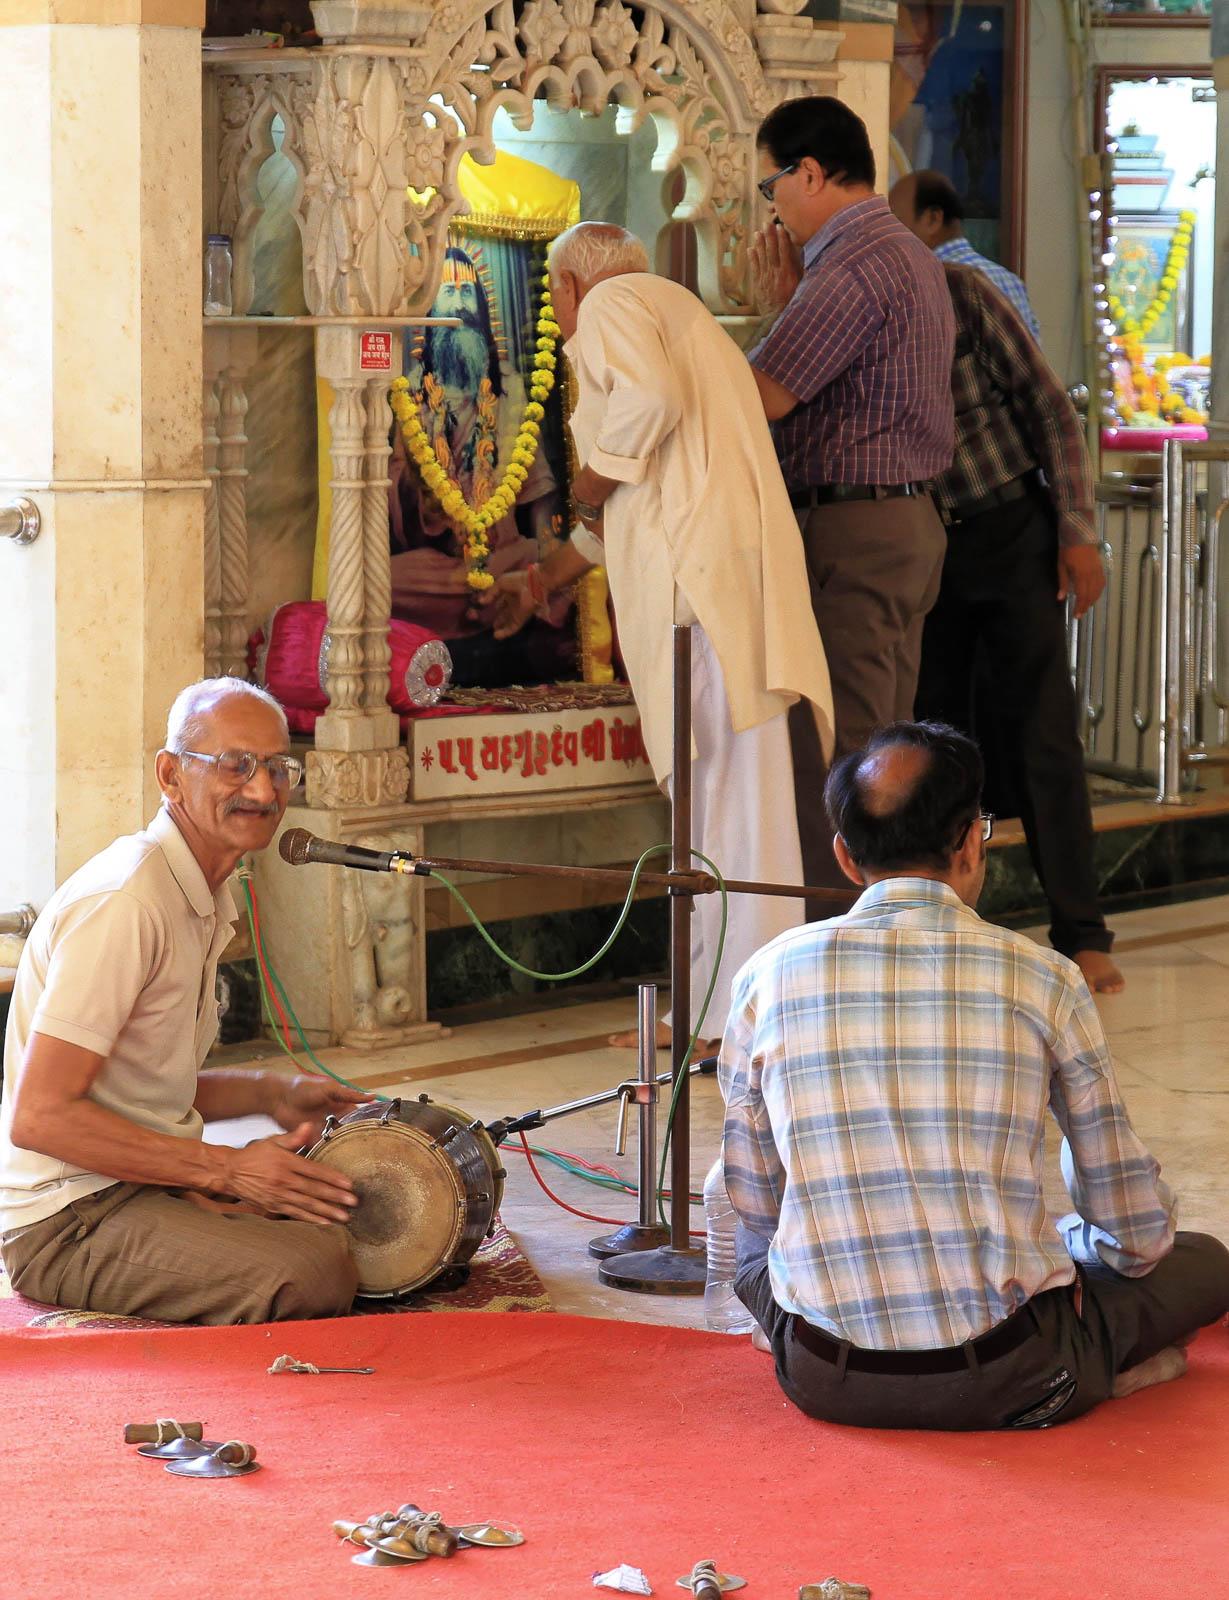 1031_Jamnagar_Bala-Hanuman-Temple-3.jpg